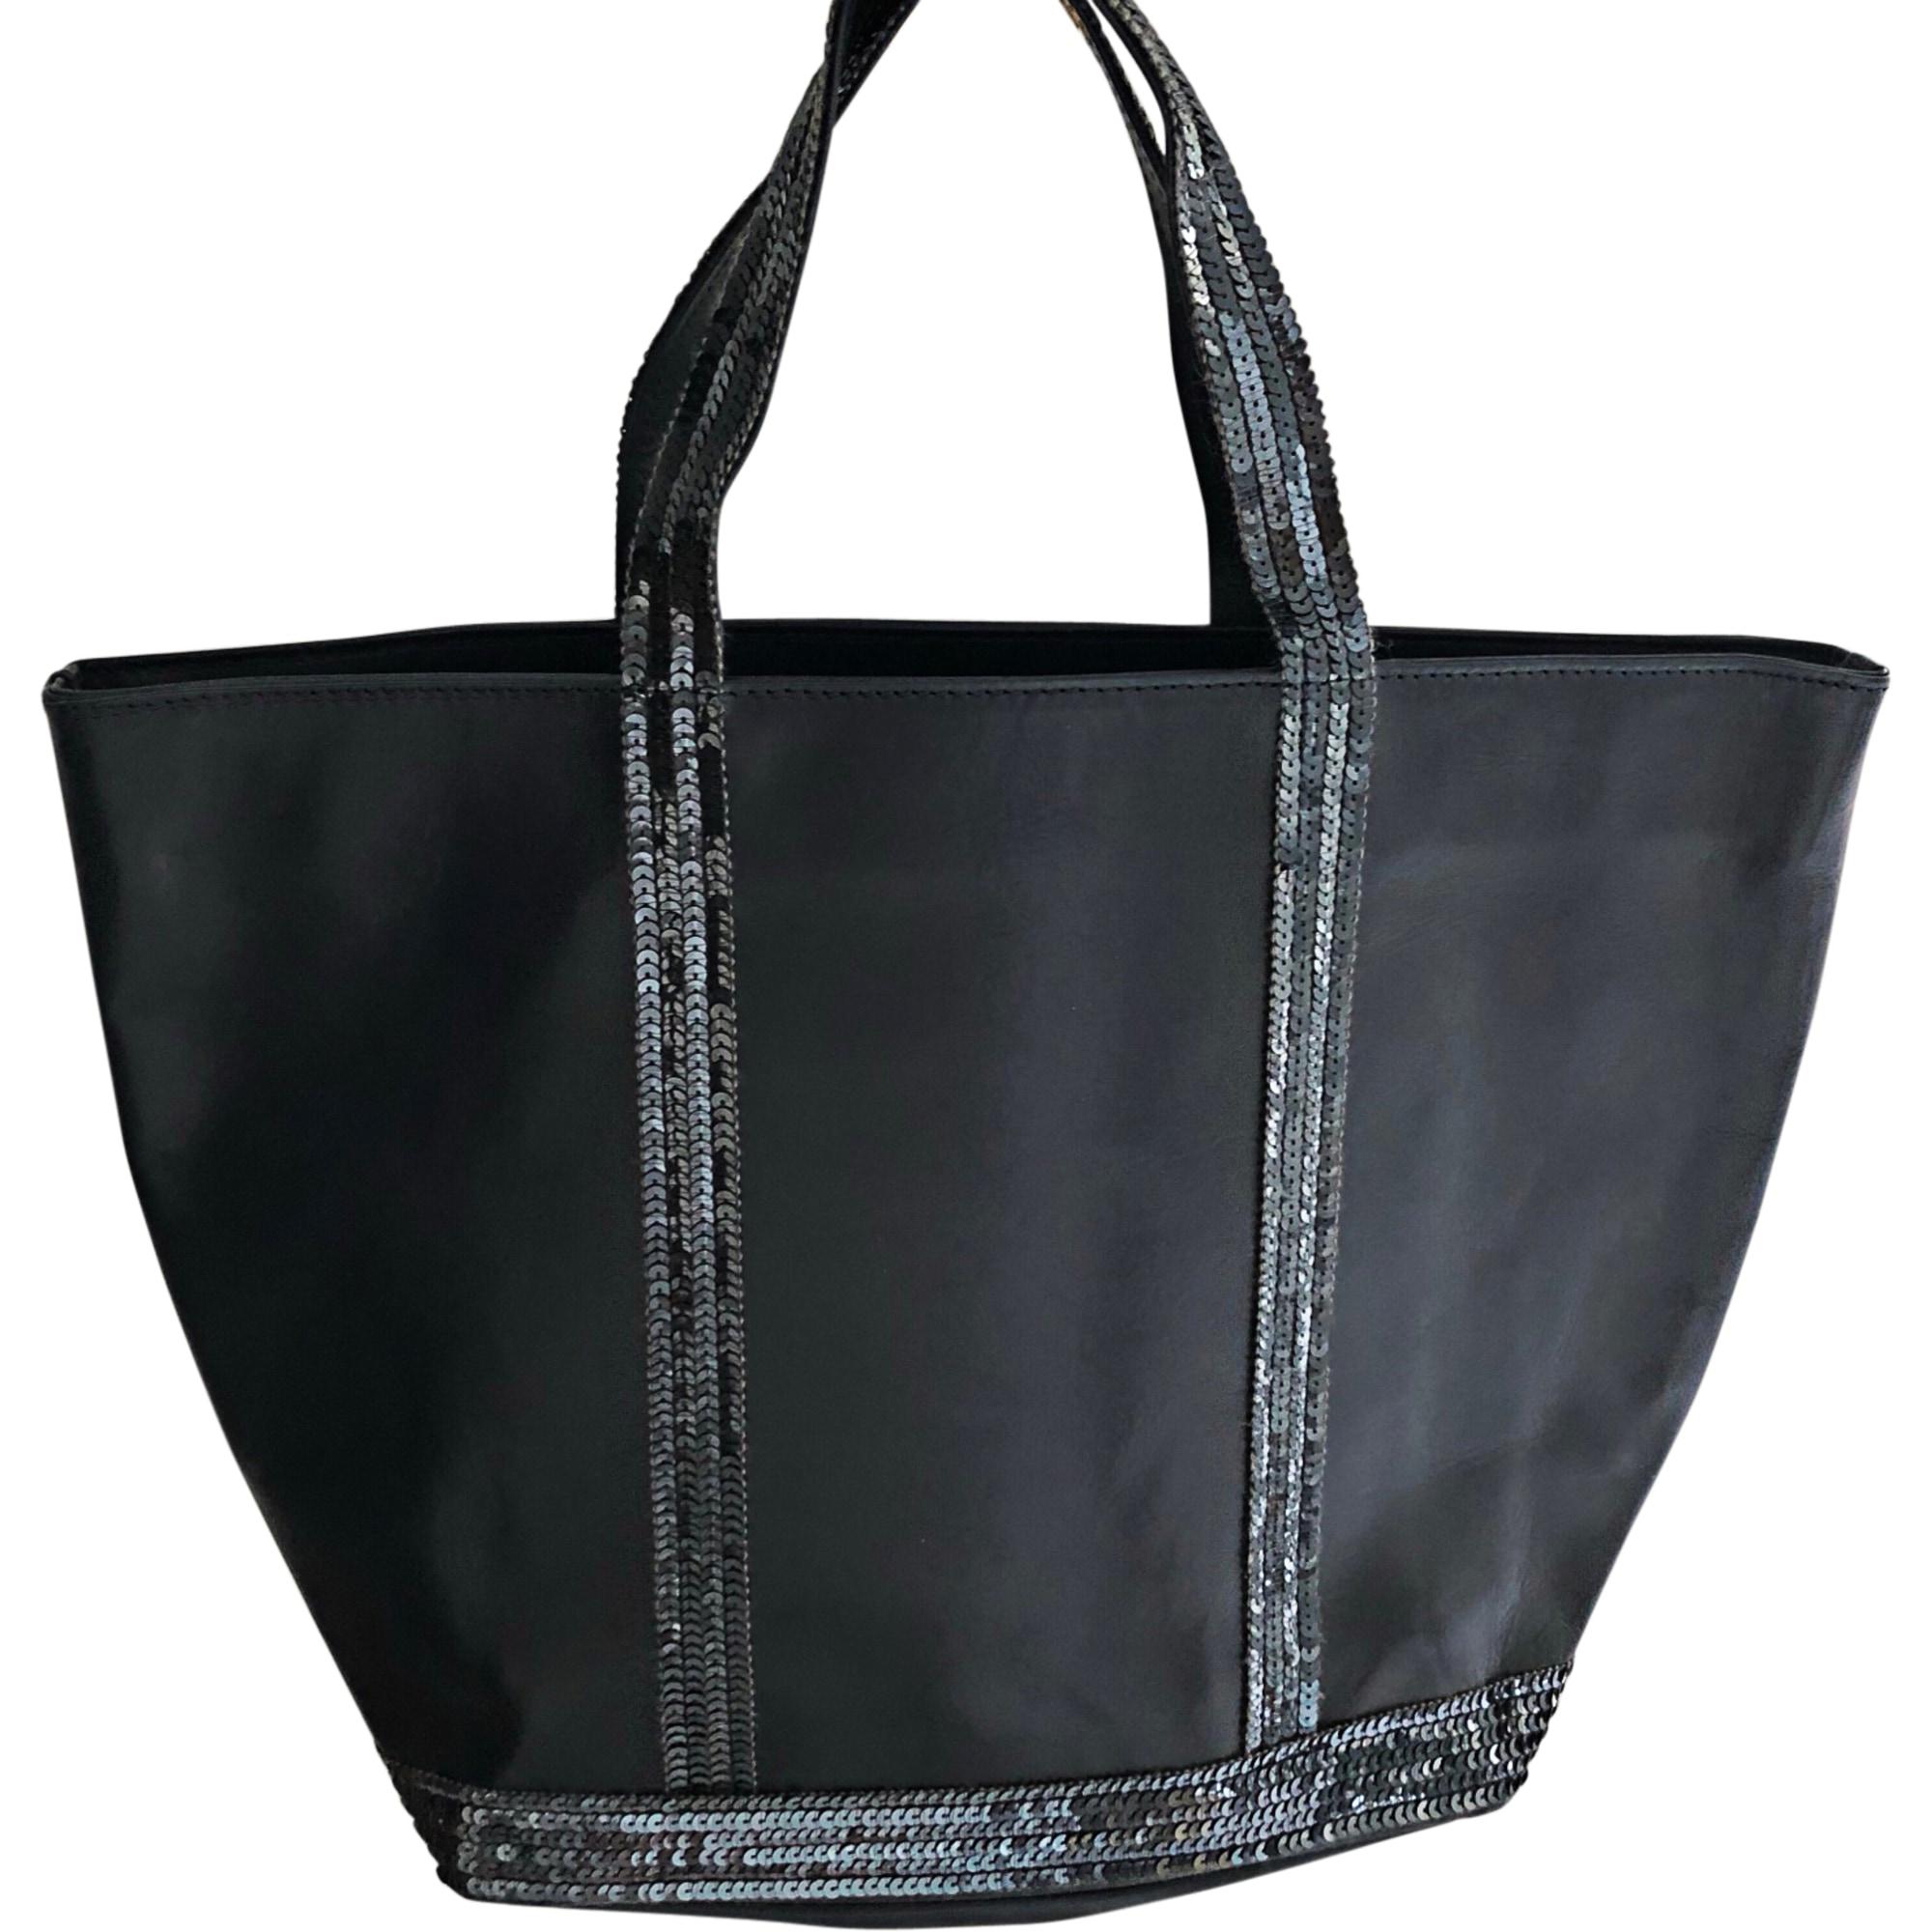 Leather Handbag VANESSA BRUNO Bleu nuit